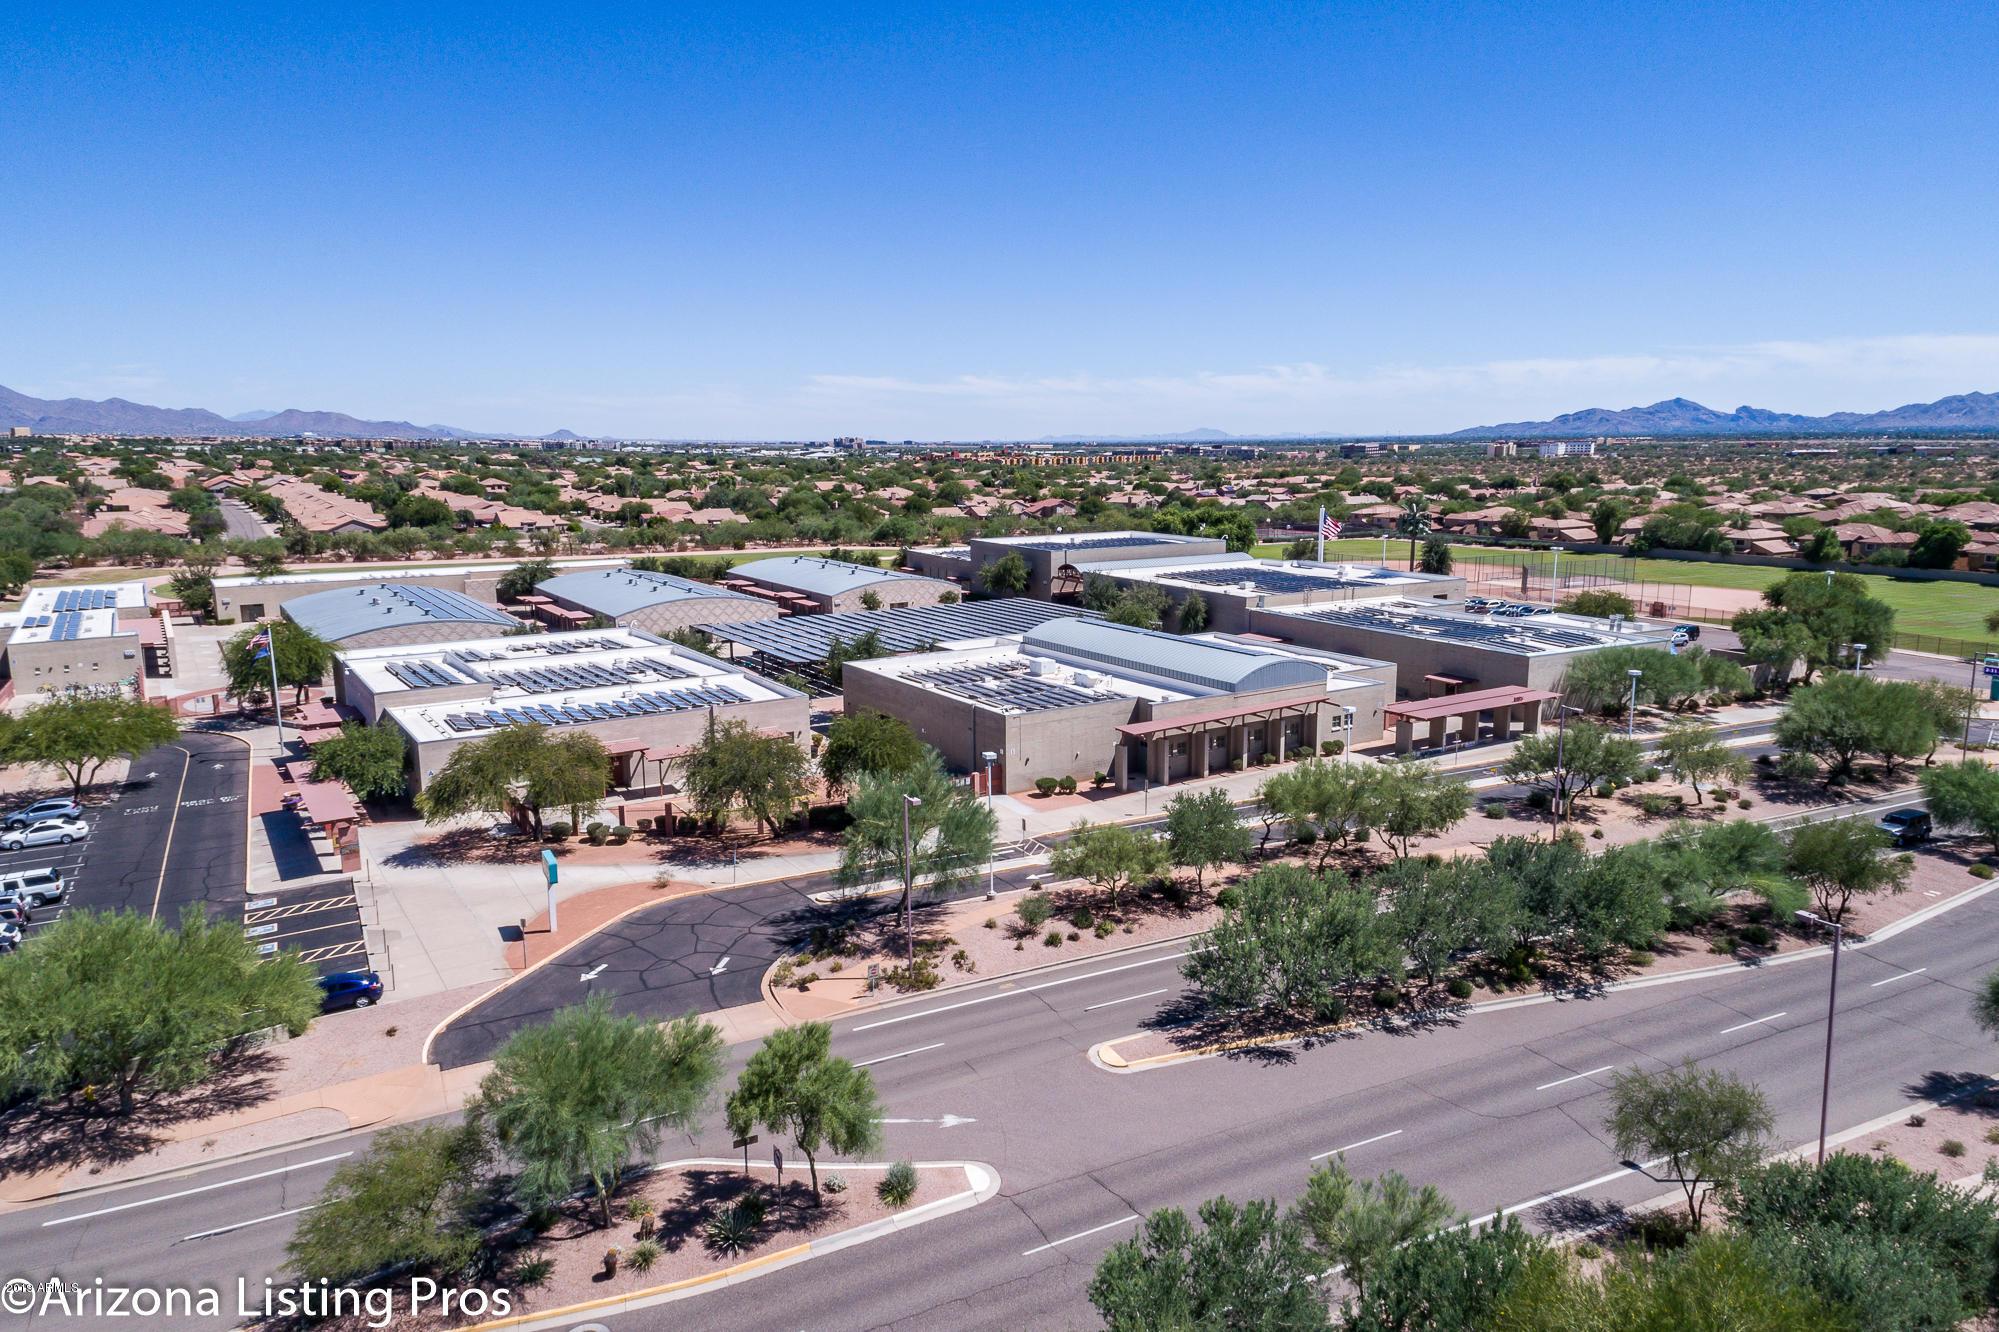 MLS 5875206 3850 E TRACKER Trail, Phoenix, AZ 85050 Phoenix AZ Desert View